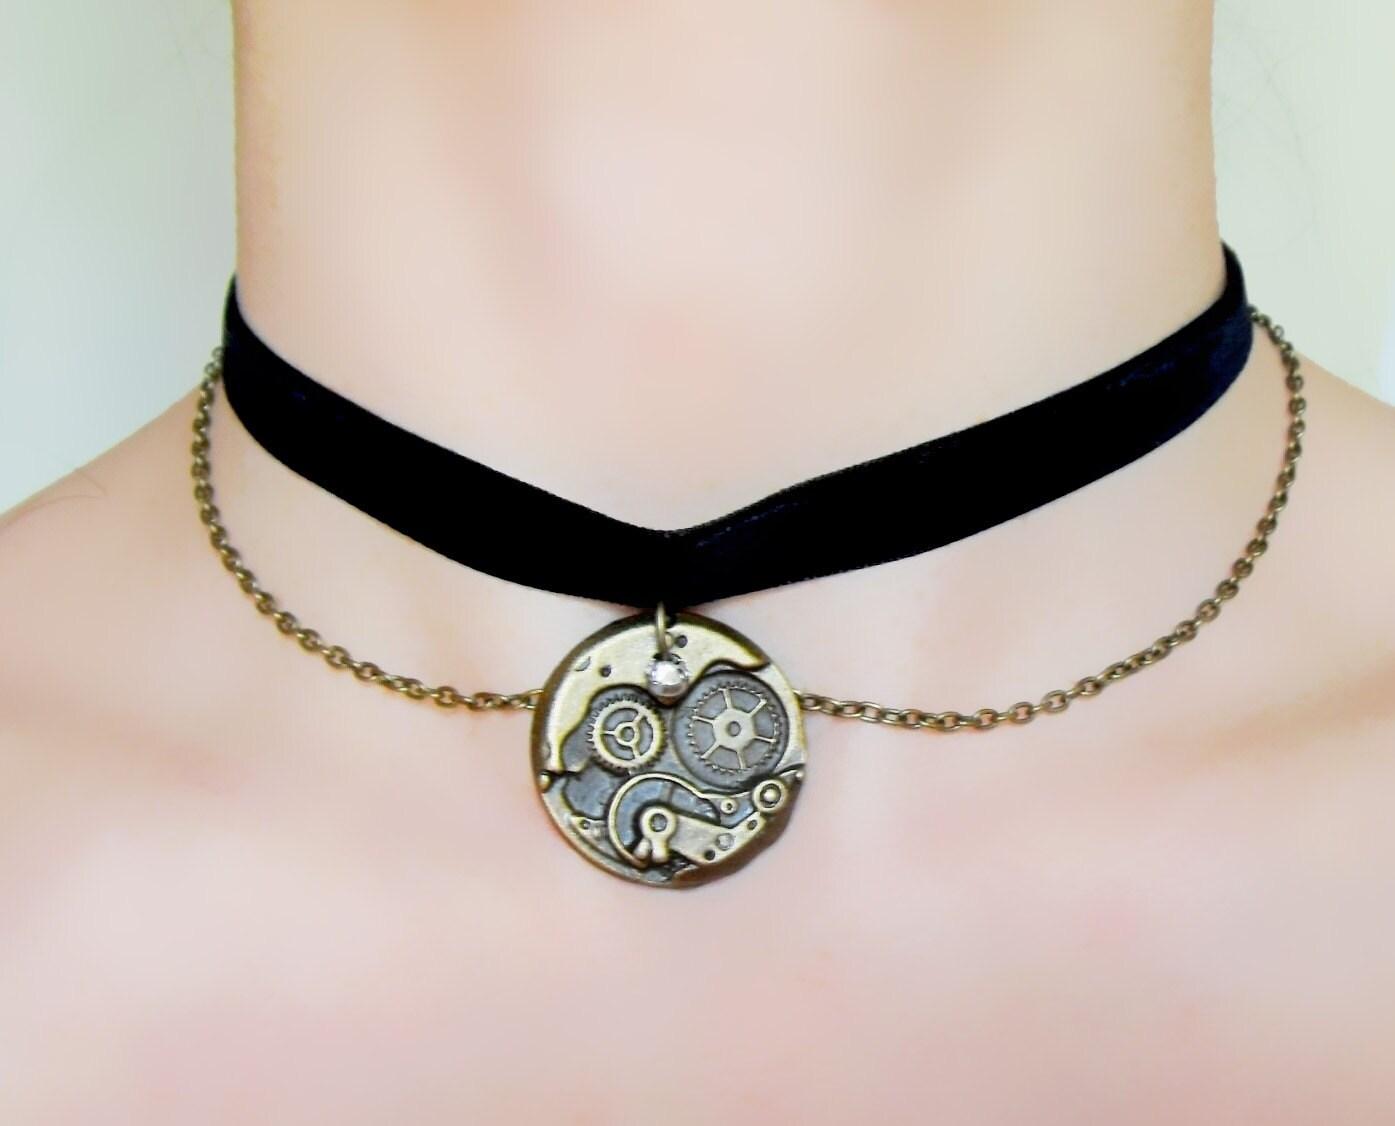 sale black velvet choker necklace steunk charm necklace